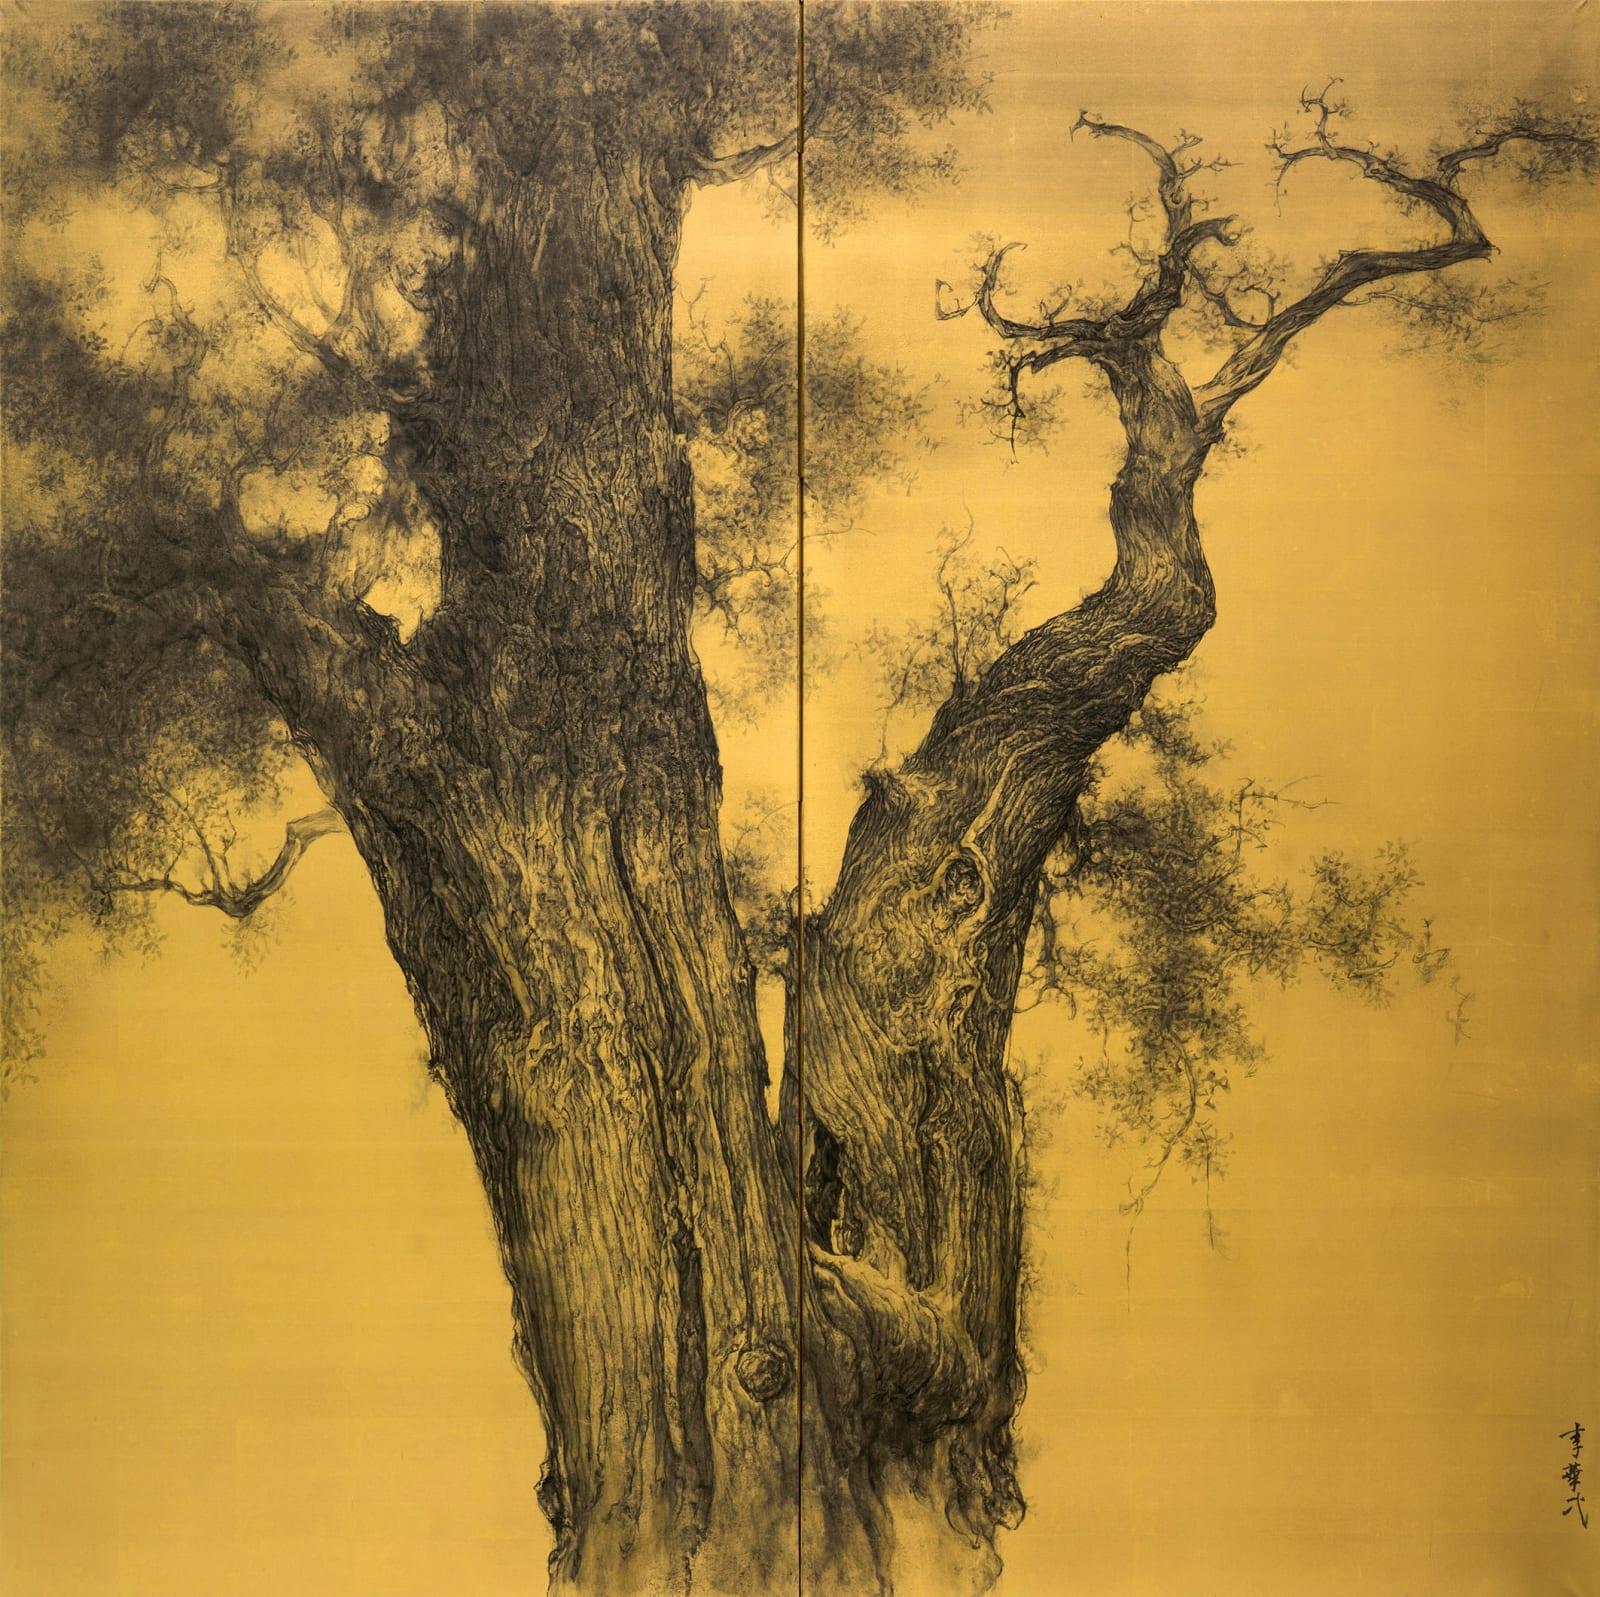 Li Huayi 李華弌, Old Cypress 《古柏》, 2016